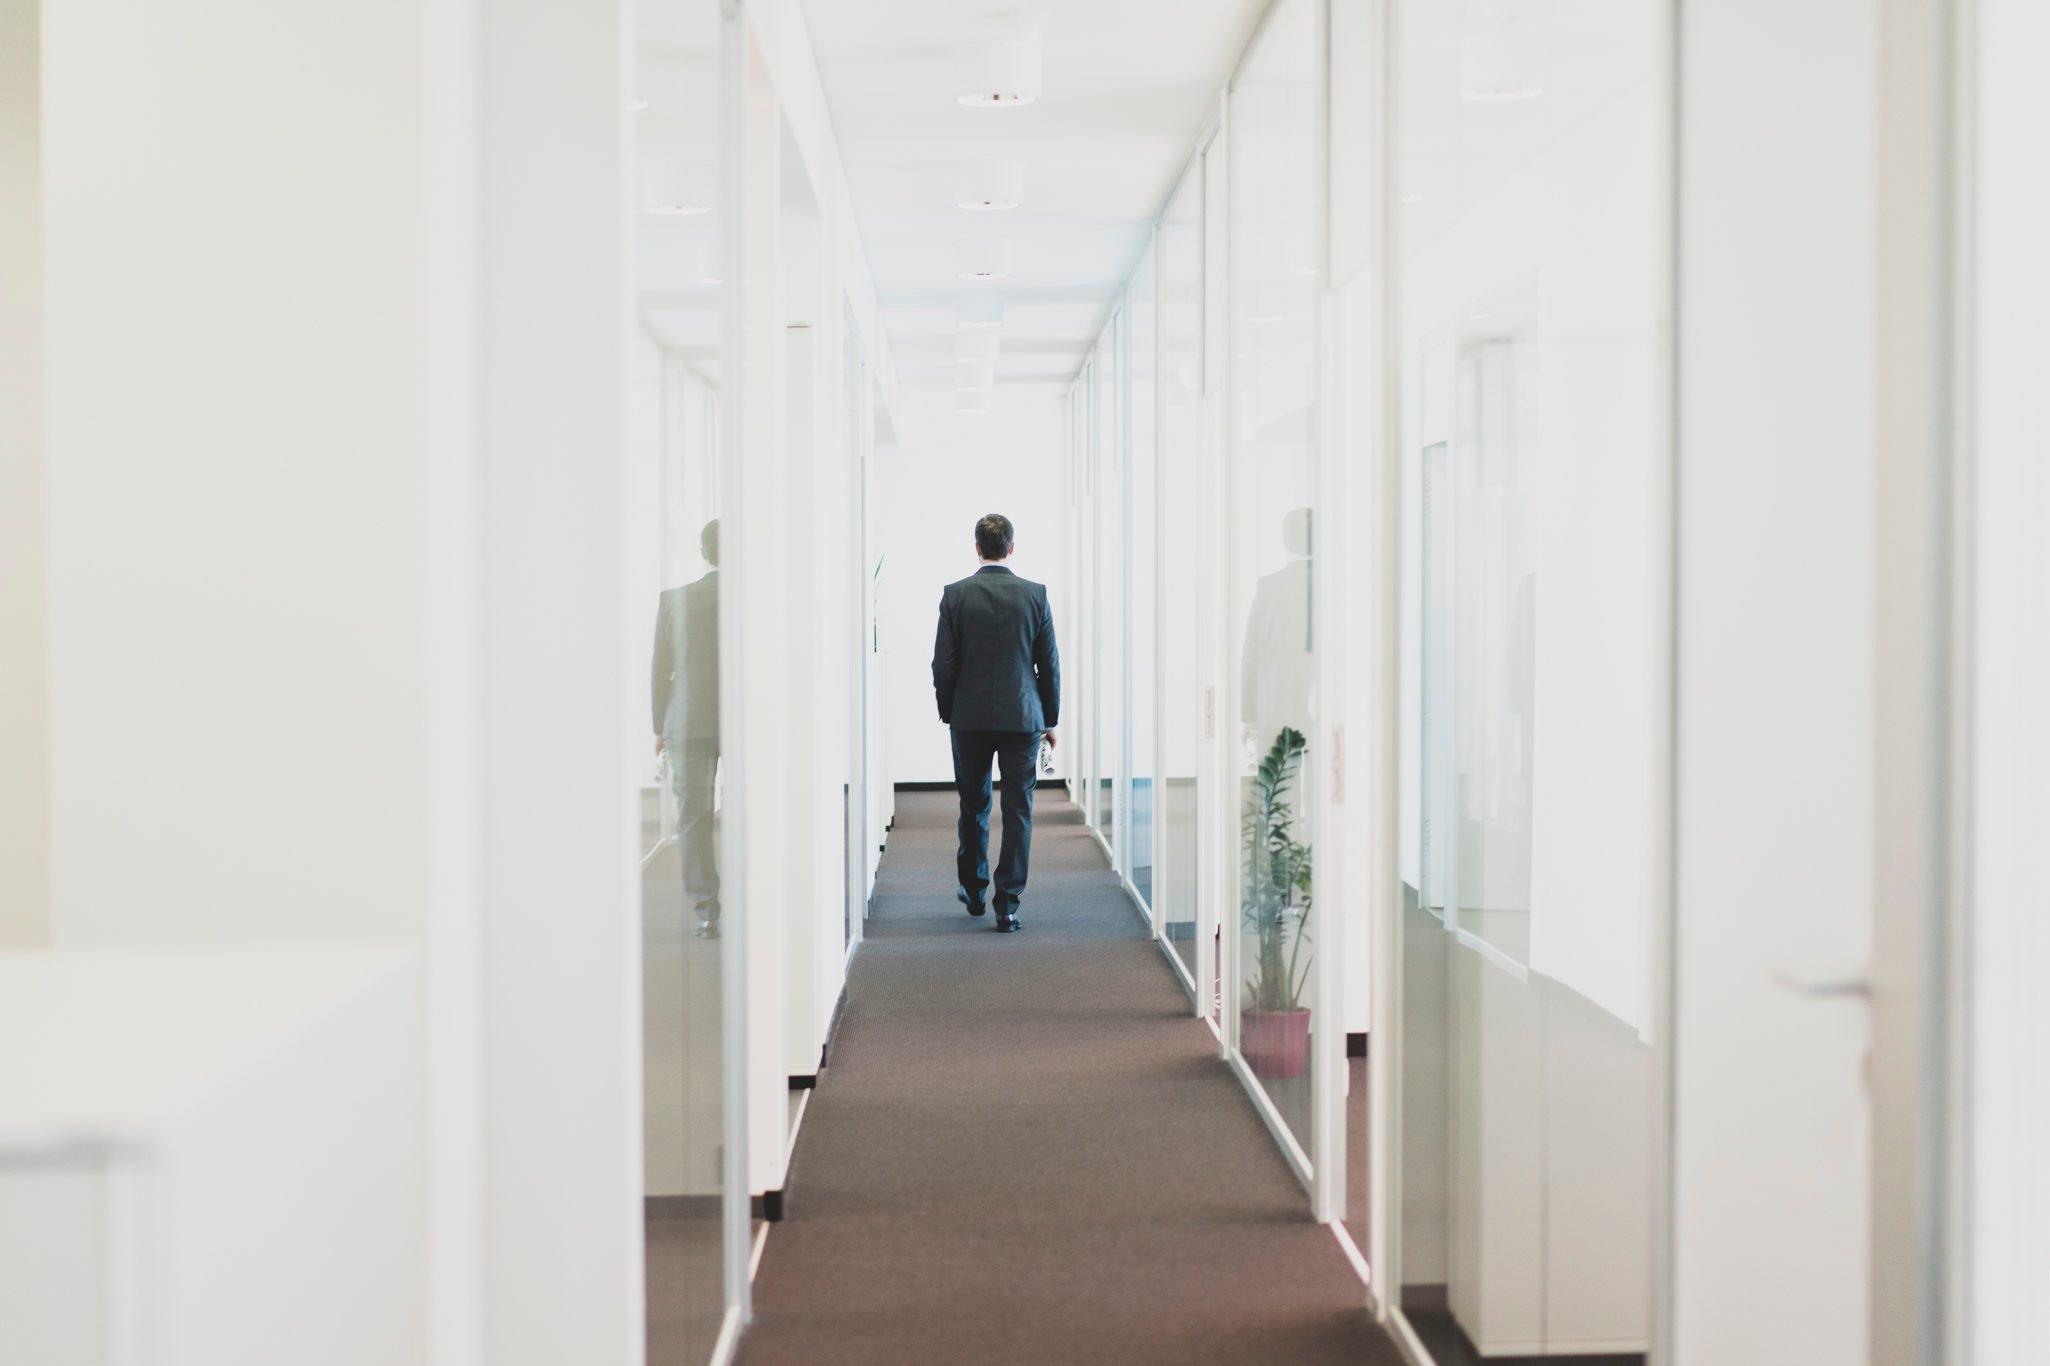 Rear view of businessman walking down office corridor